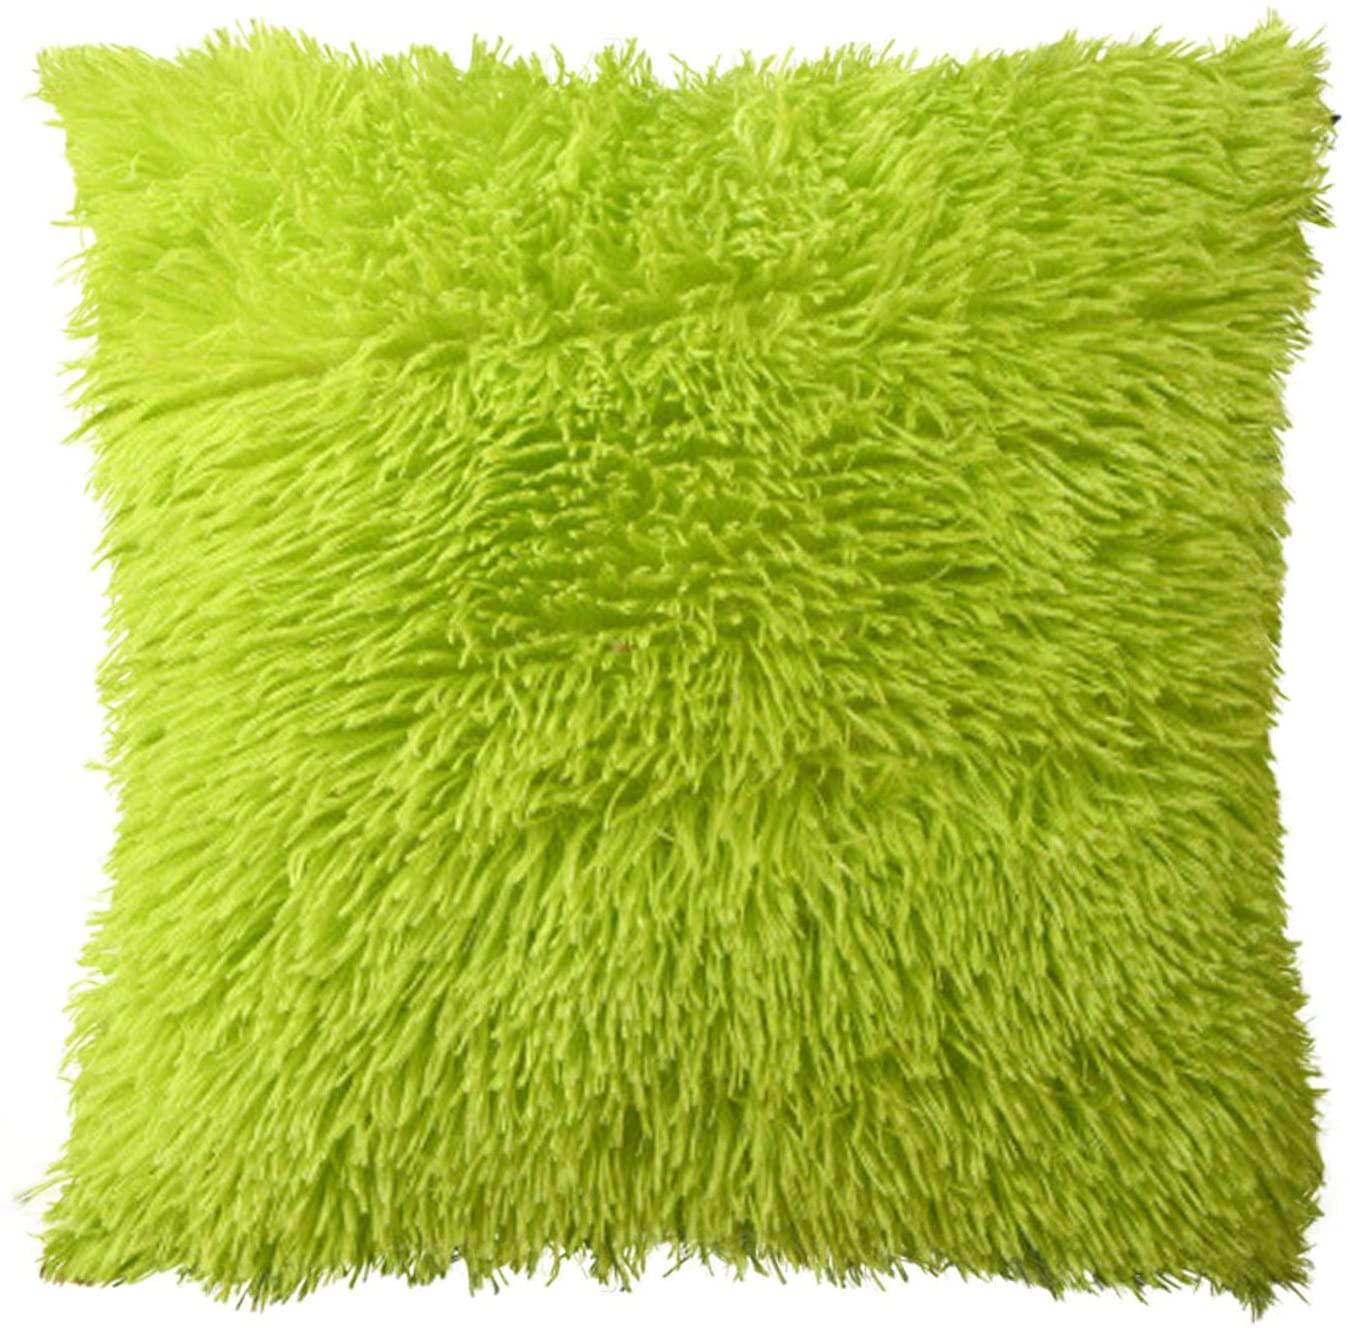 Plush Pillowcase Cushion Cover Sofa Lumbar Pillow Cover Home Decoration Solid Colorful Pillowcase